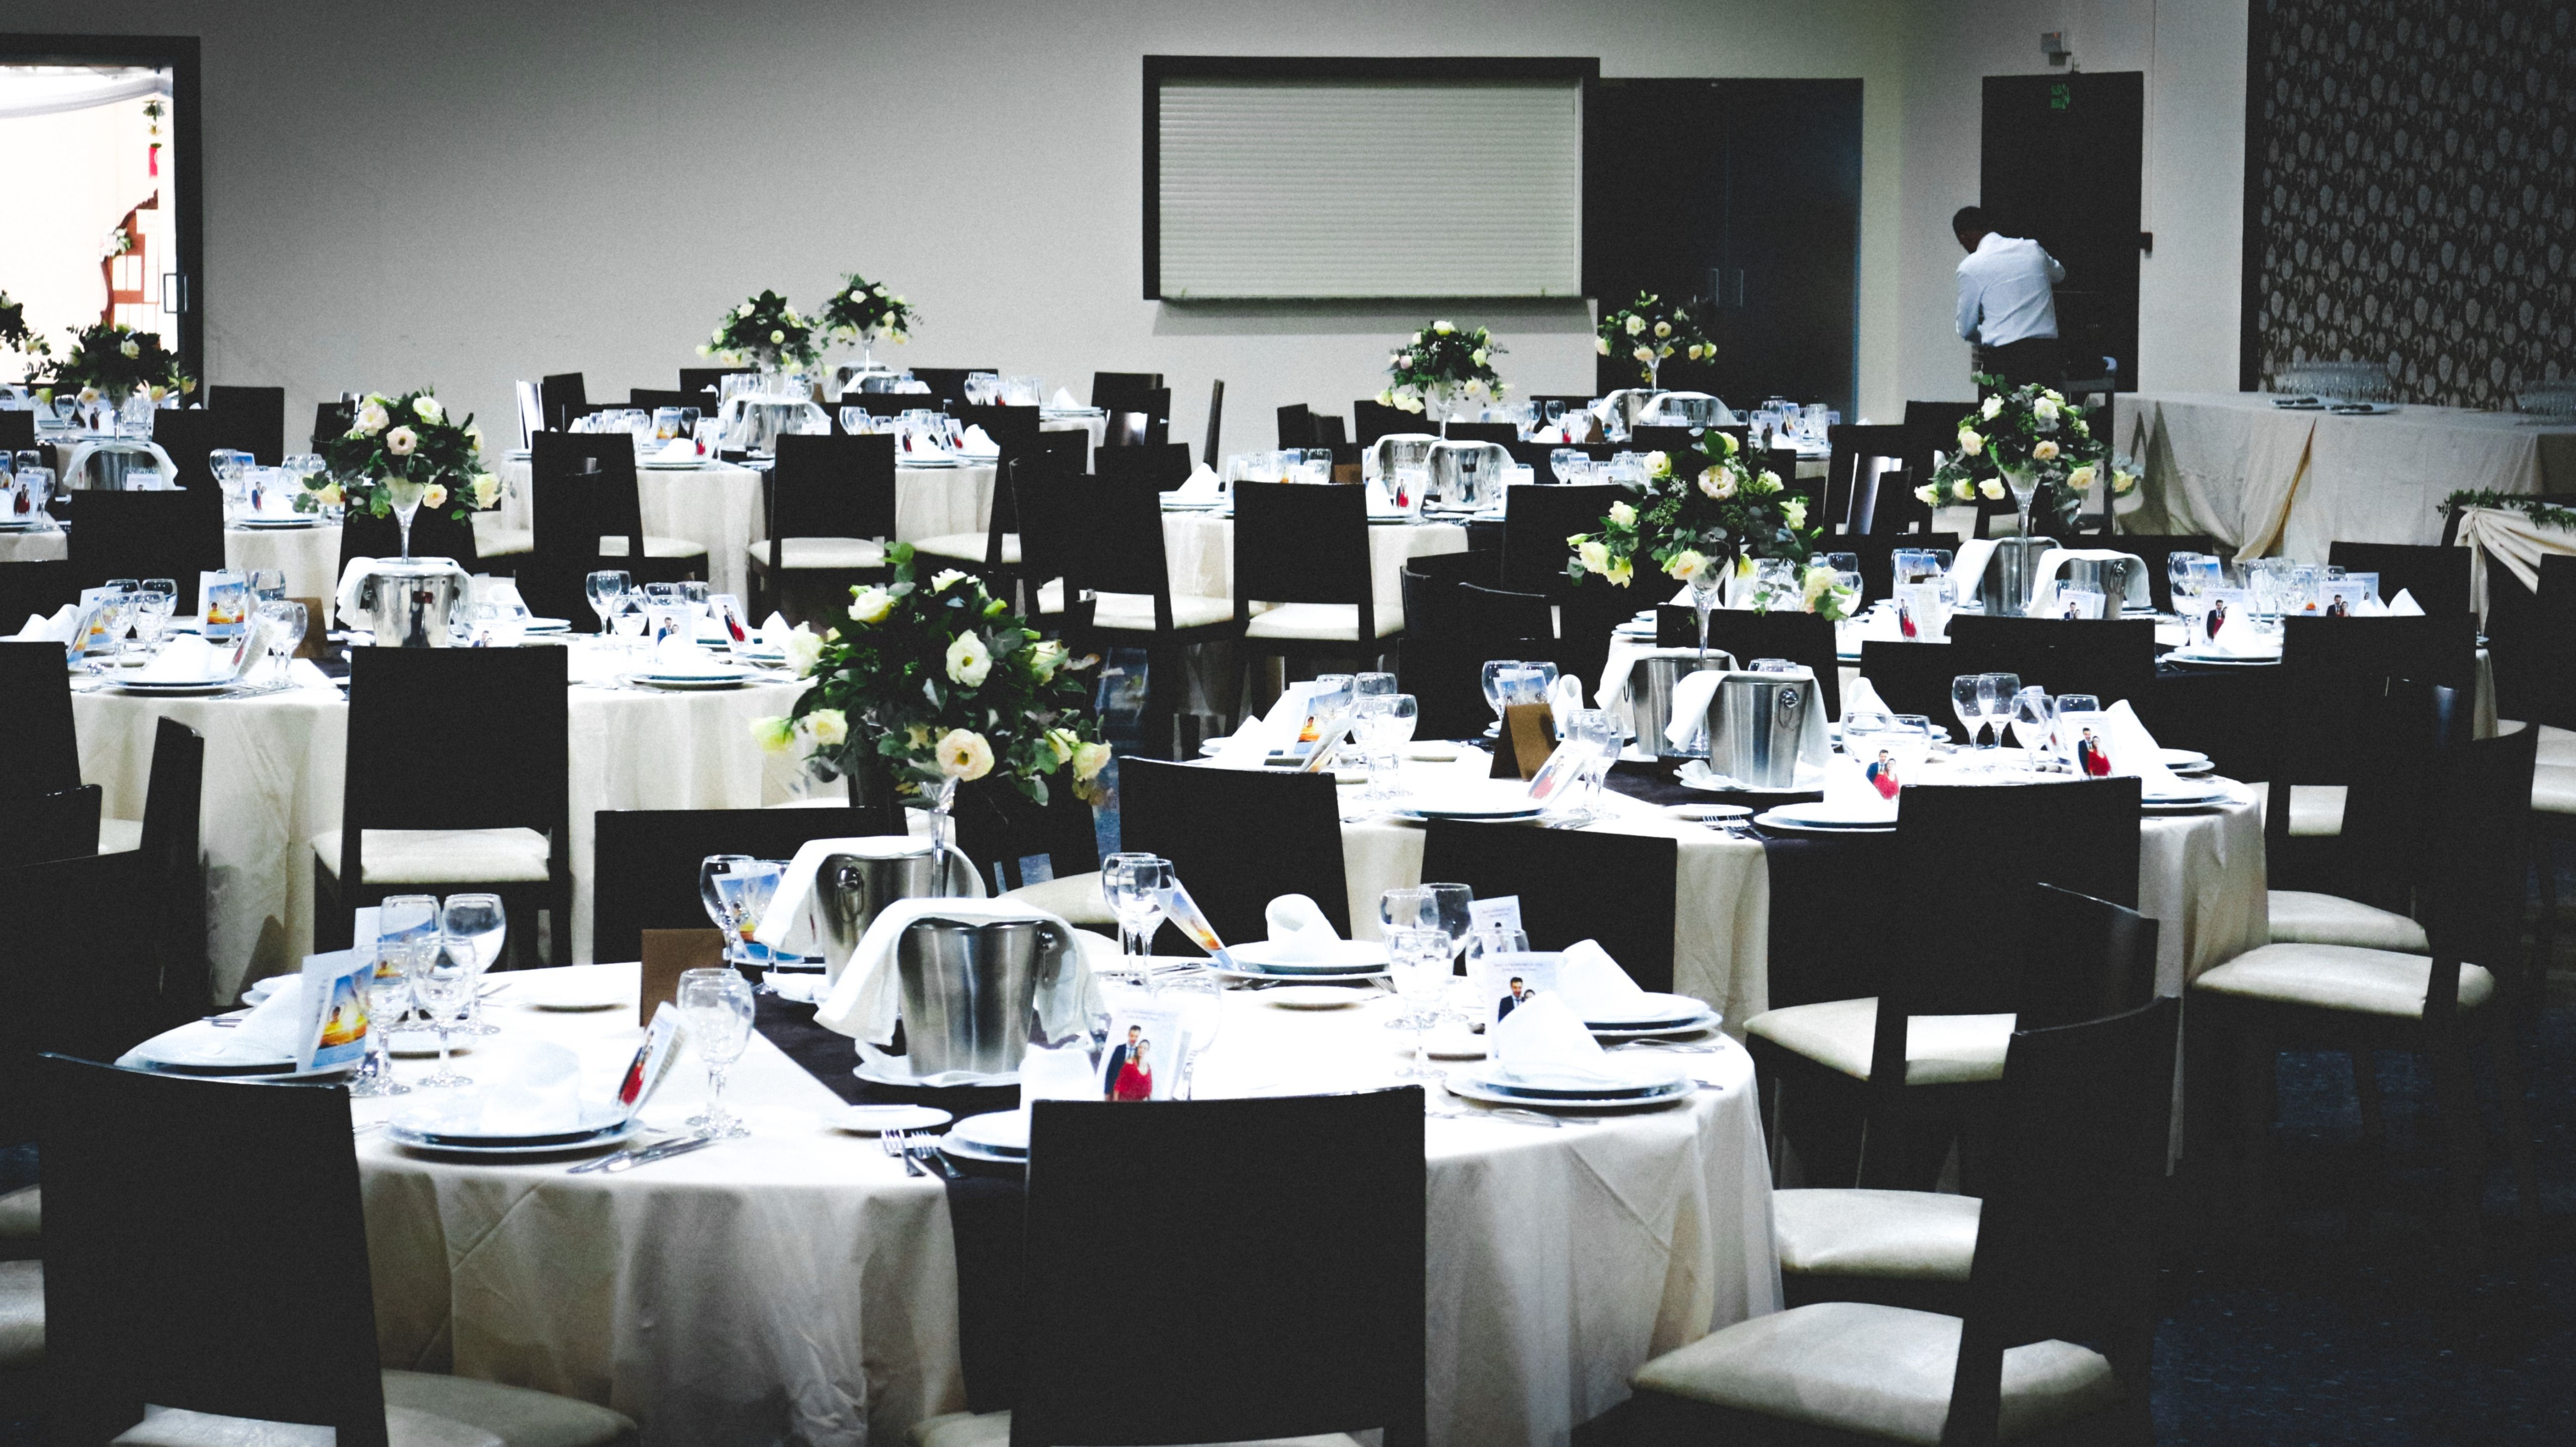 Foto 2 de Restaurante con salones para banquetes en Alzira | Nou Fester